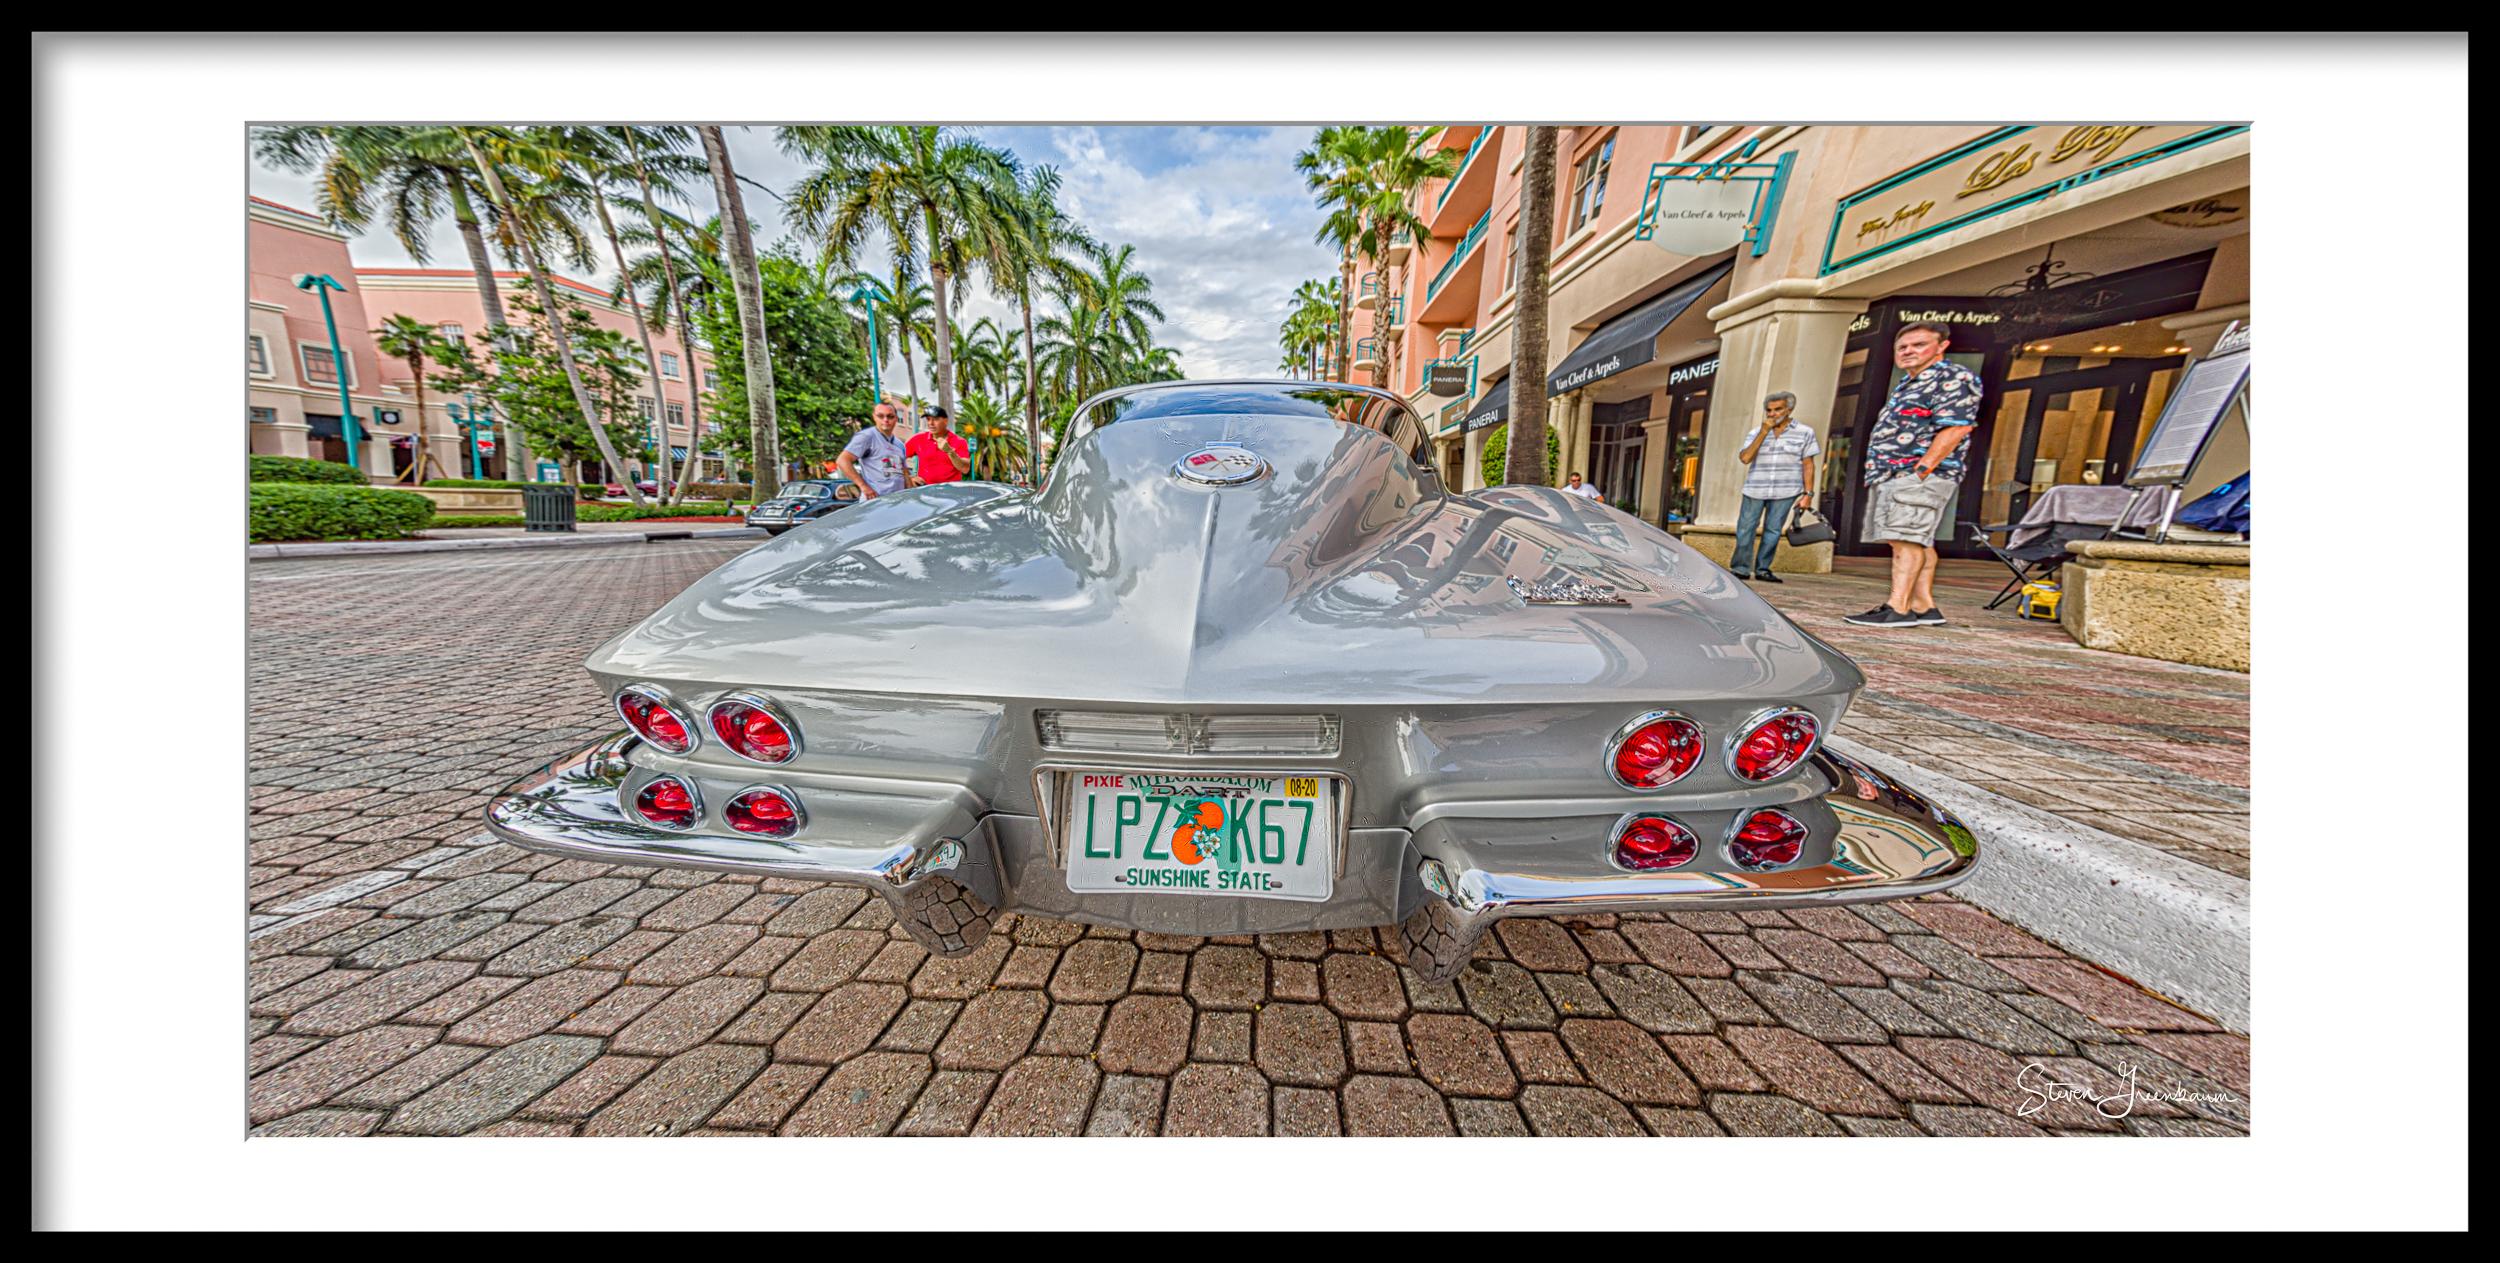 2019 Boca Raton classic car Show